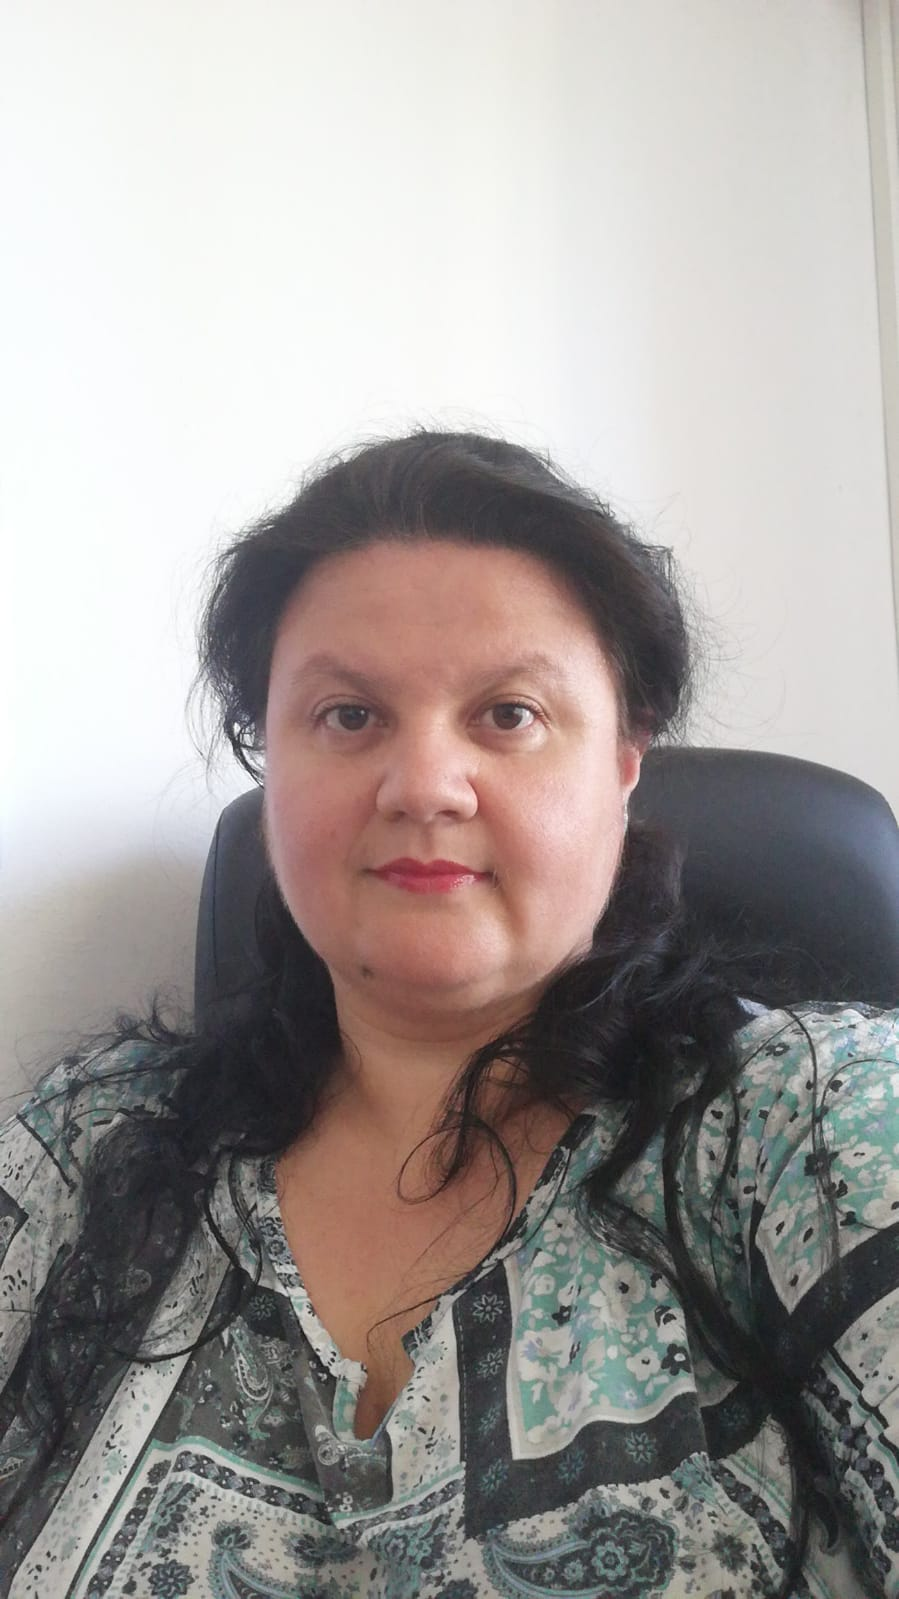 The speaker Oana Luisa Dumitru,'s profile image